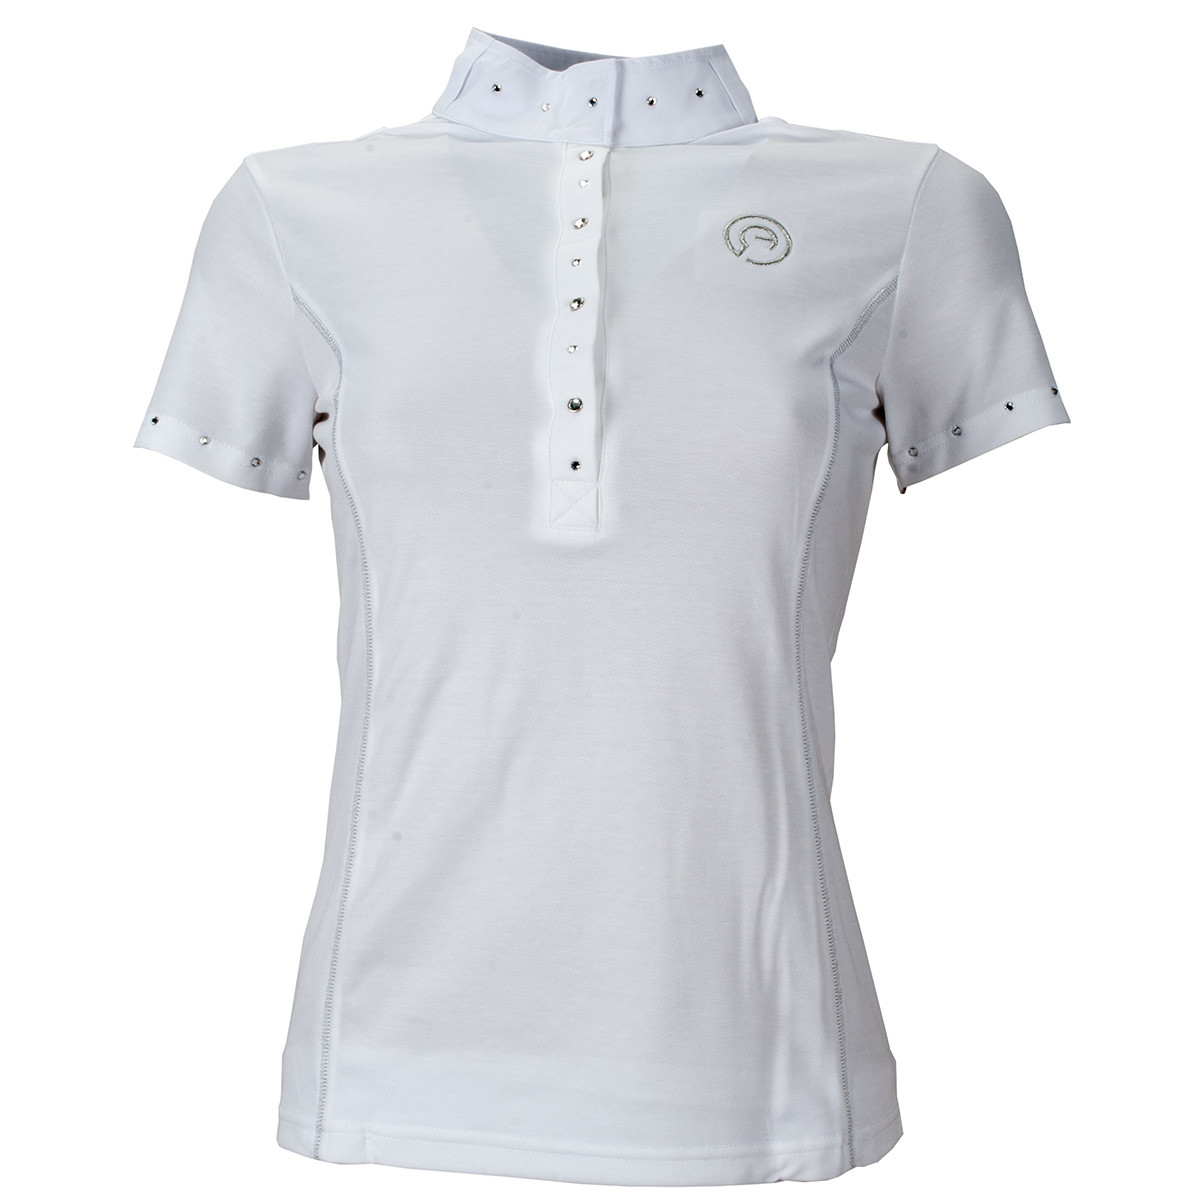 Anky Glamour Turniershirt